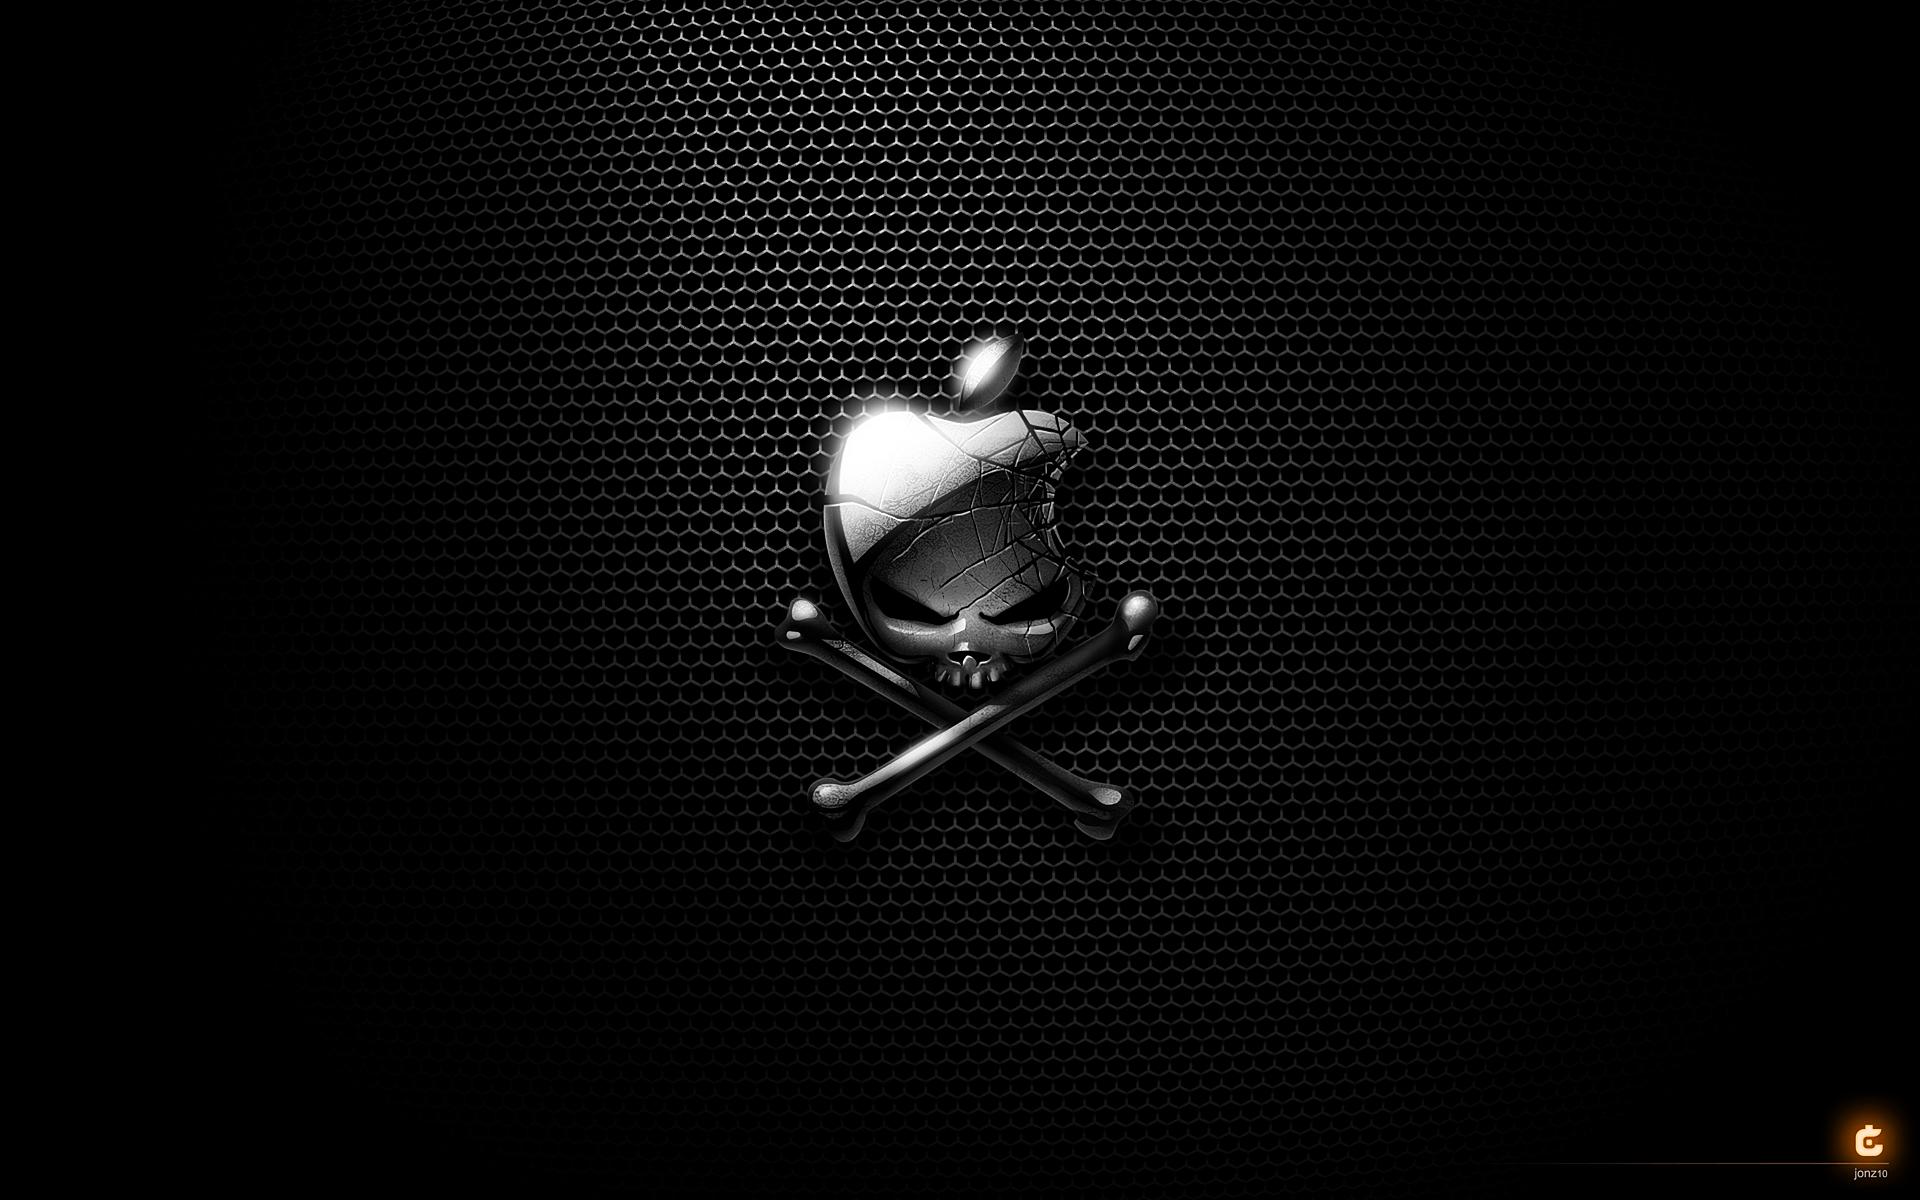 Hackintosh desktop